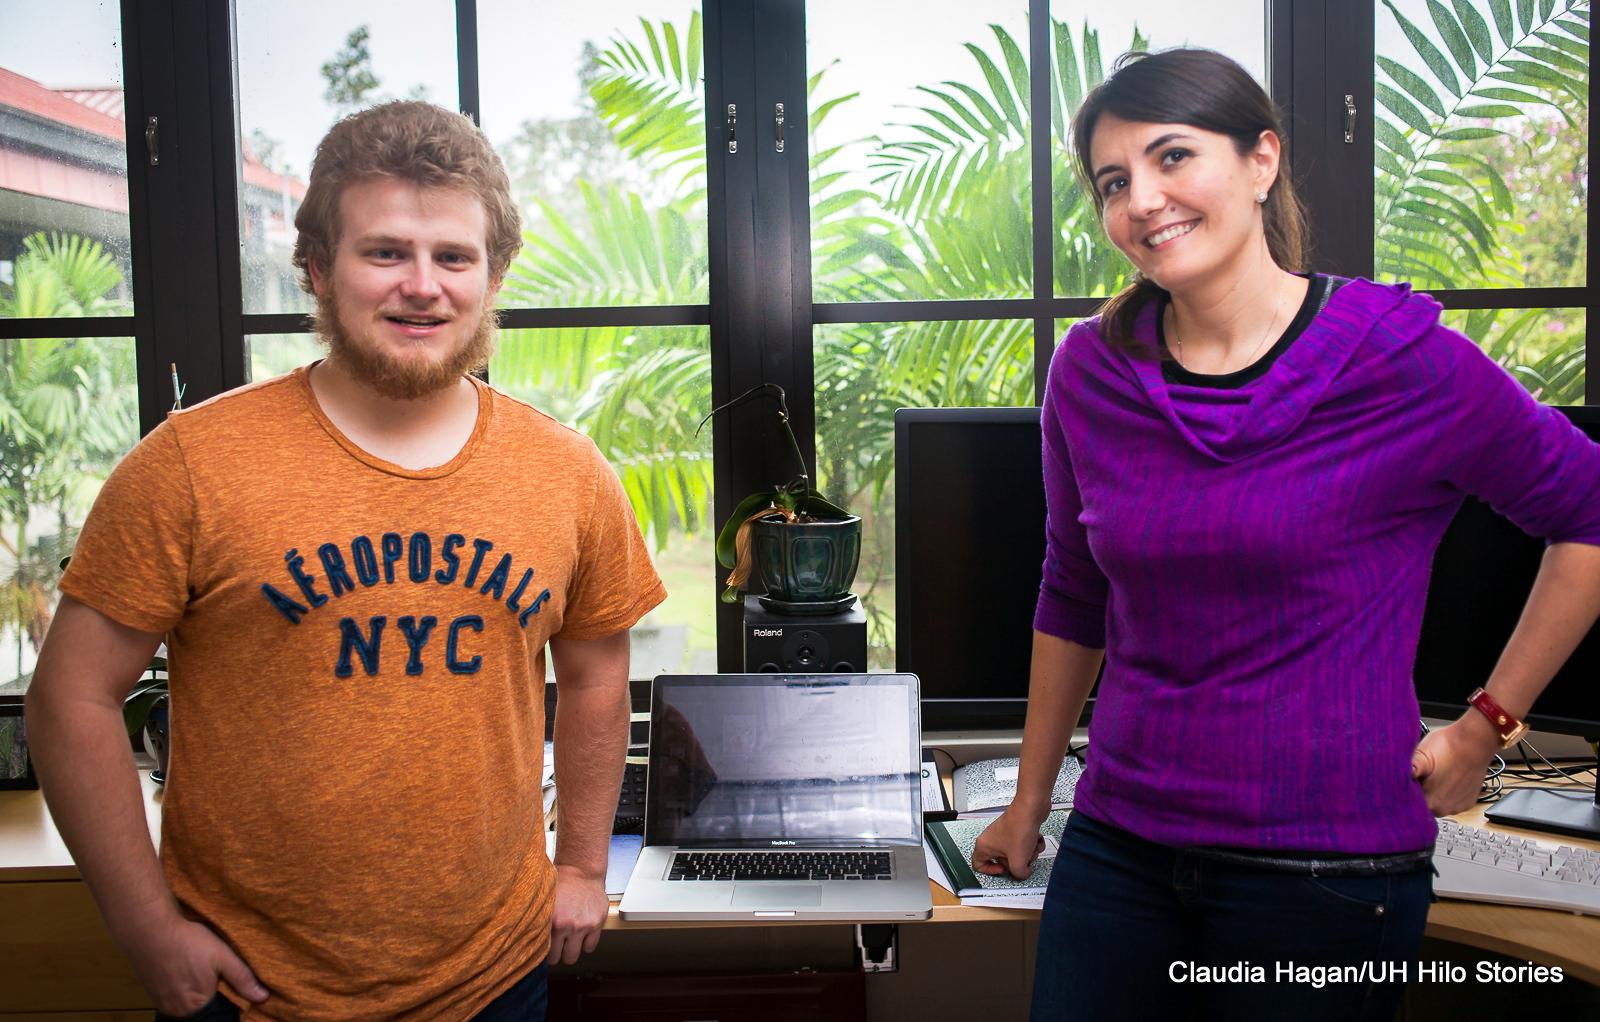 UH Hilo undergraduate Derek Hand conducting astronomy research on merging galaxies